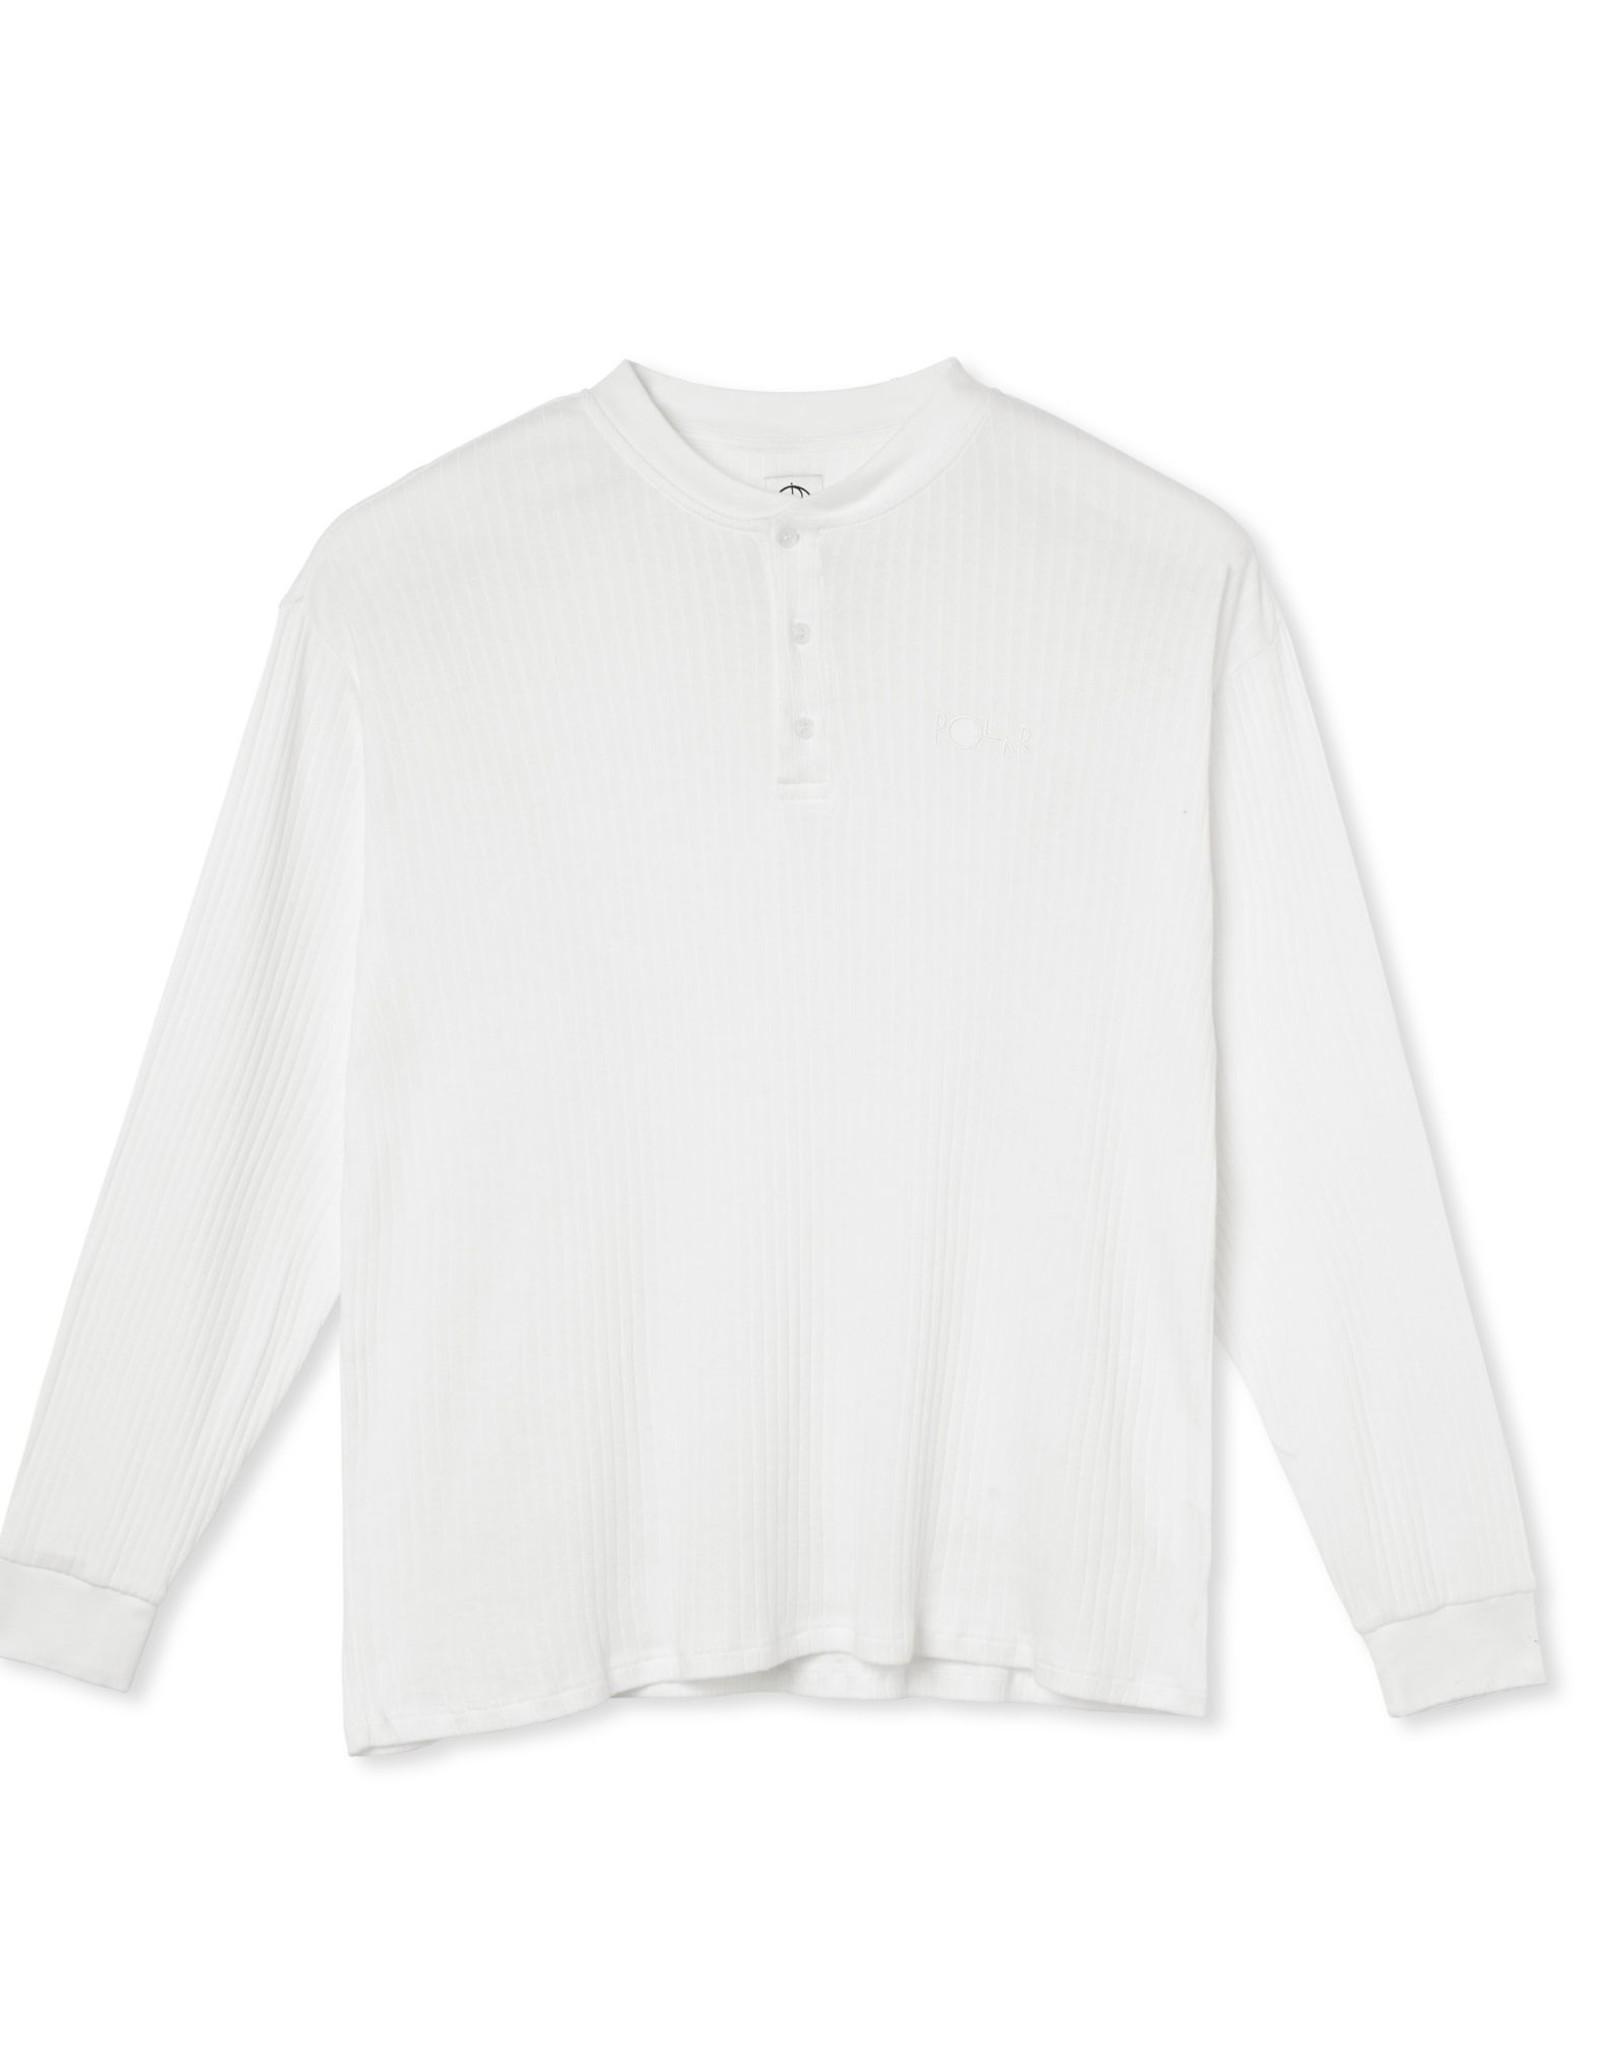 POLAR RIB HENLEY L/S SHIRT - CLOUD WHITE/WHITE